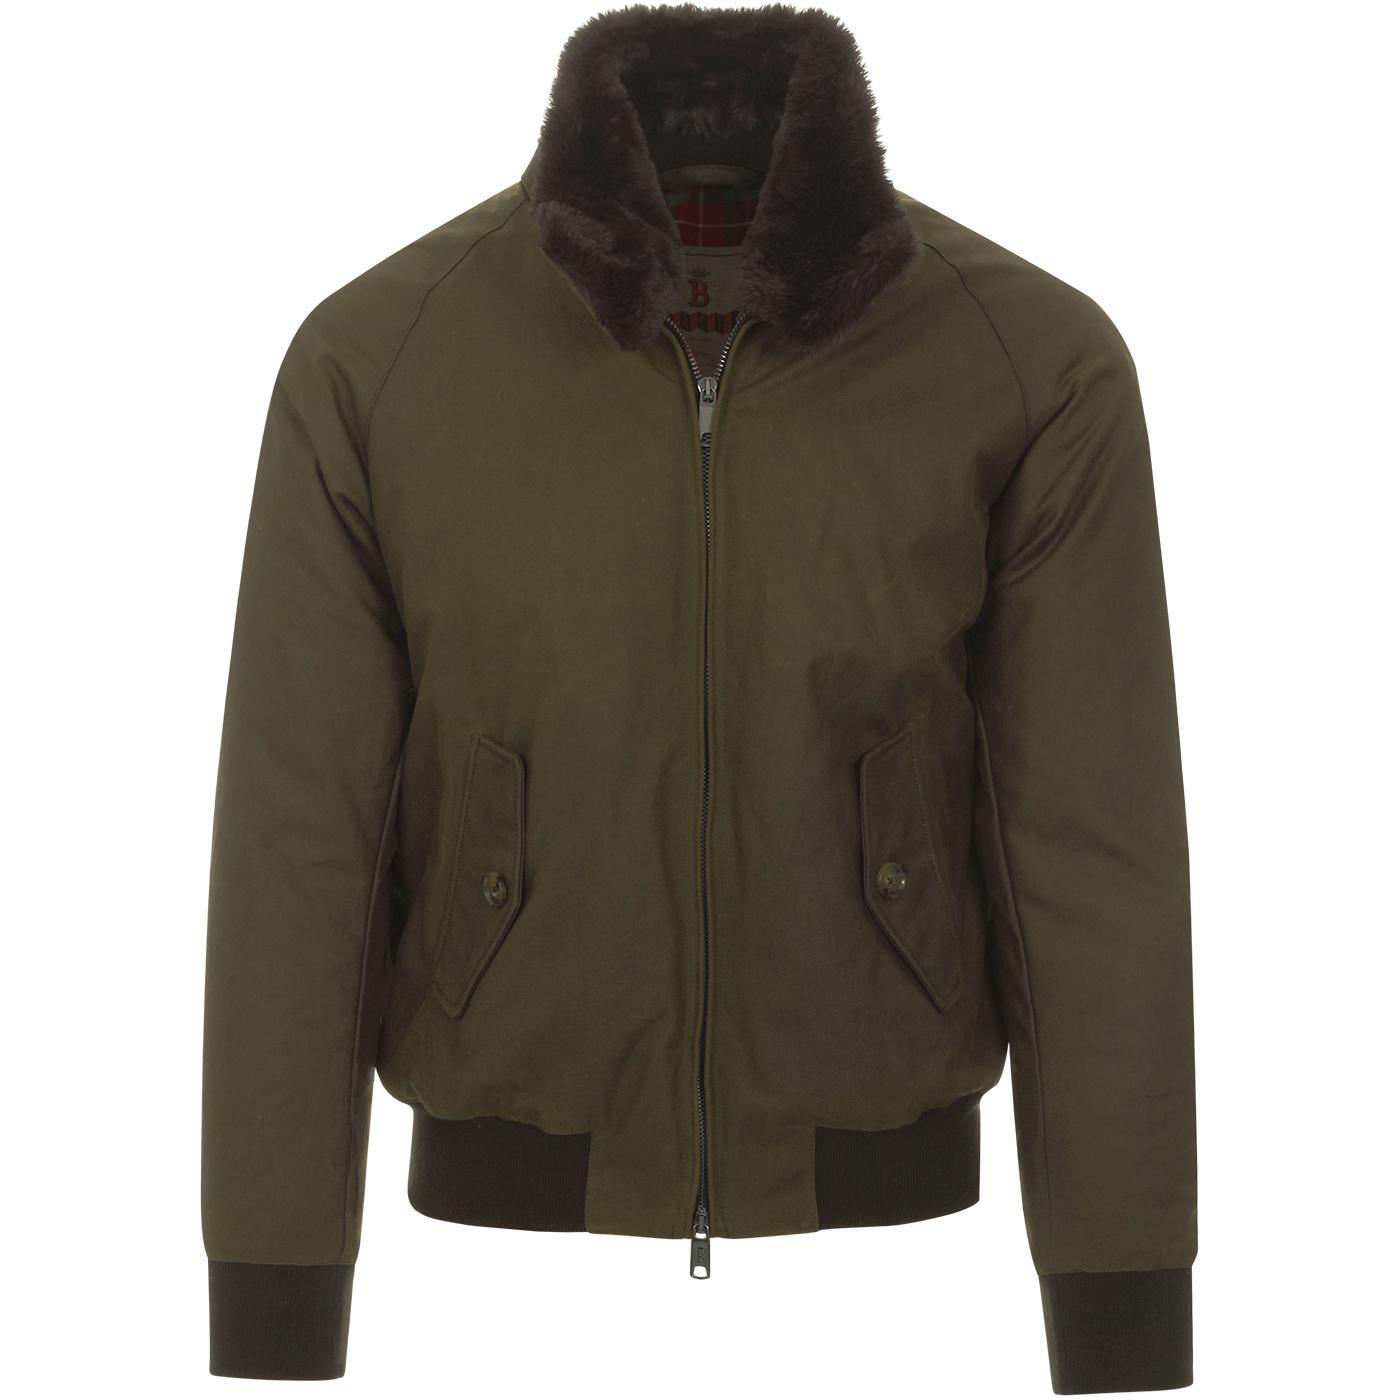 BARACUTA G9 Authentic Fit Eco Fur Collar Jacket